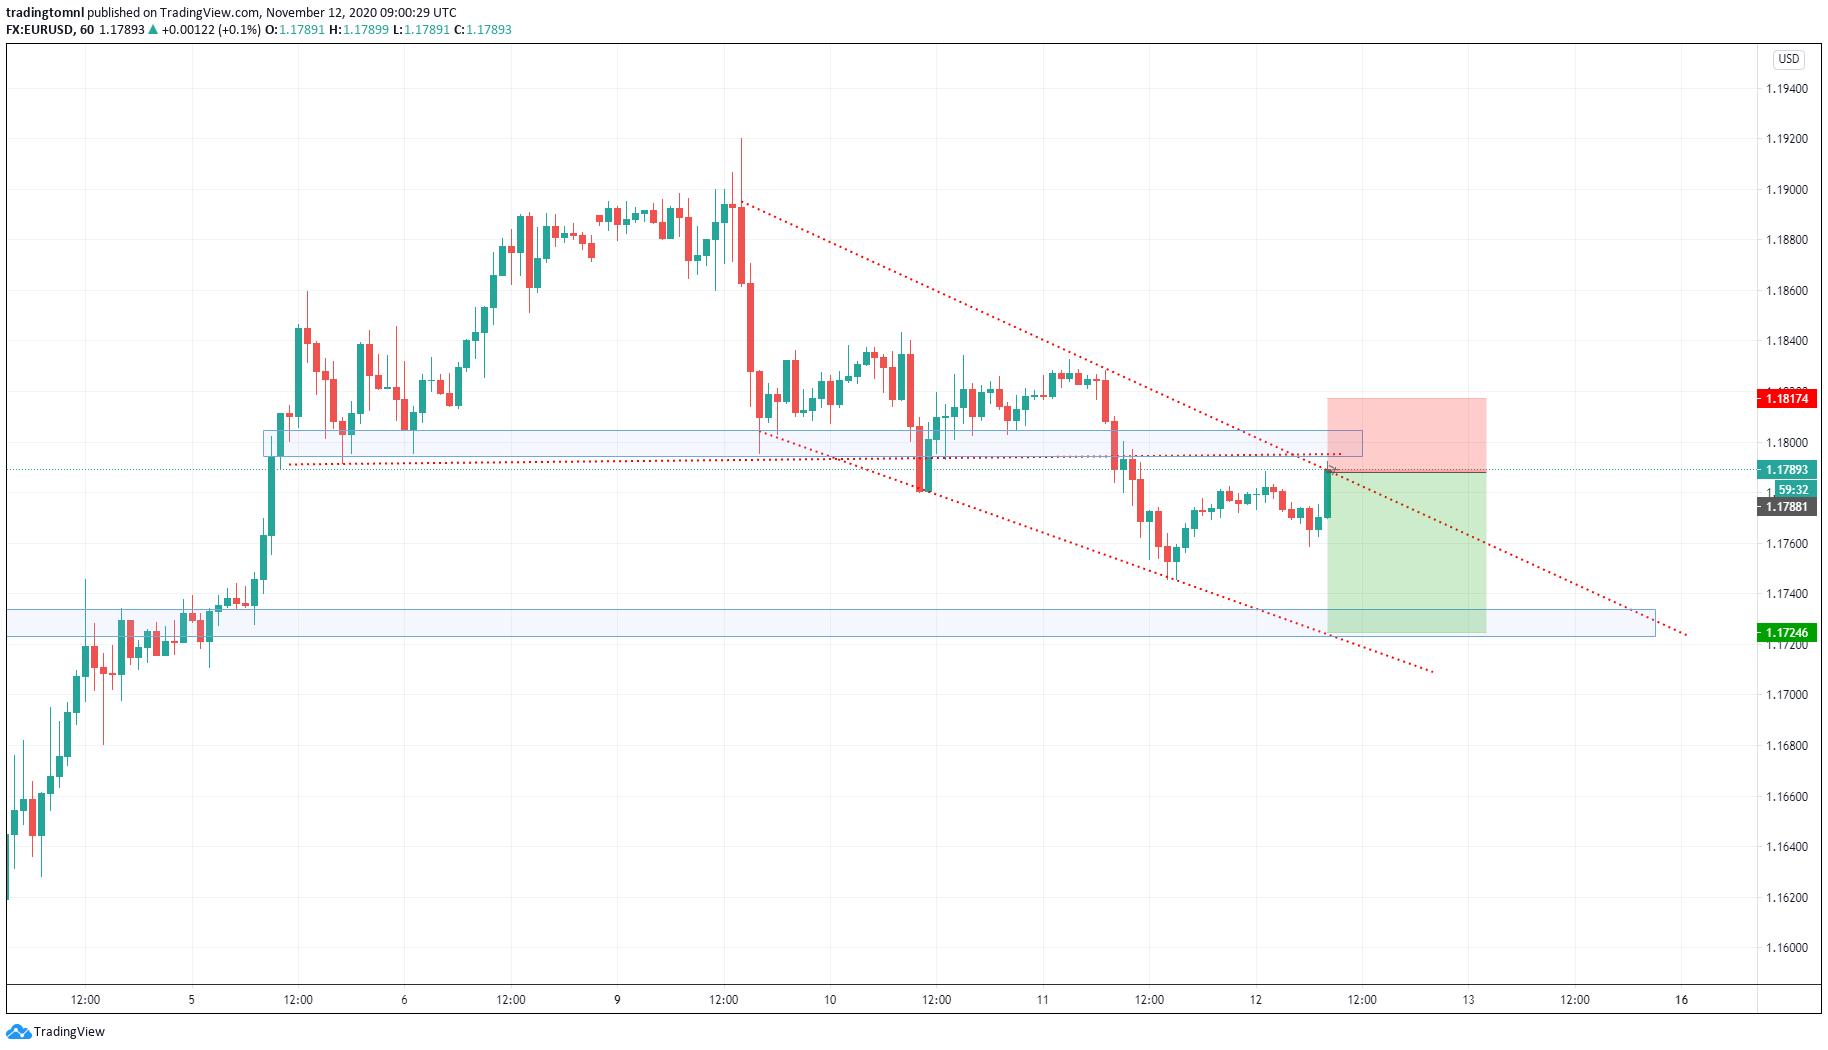 Sell EURUSD if we don't break 1.180. Take signal only if we don't break. Free signal service from start trading. Take profits easy.